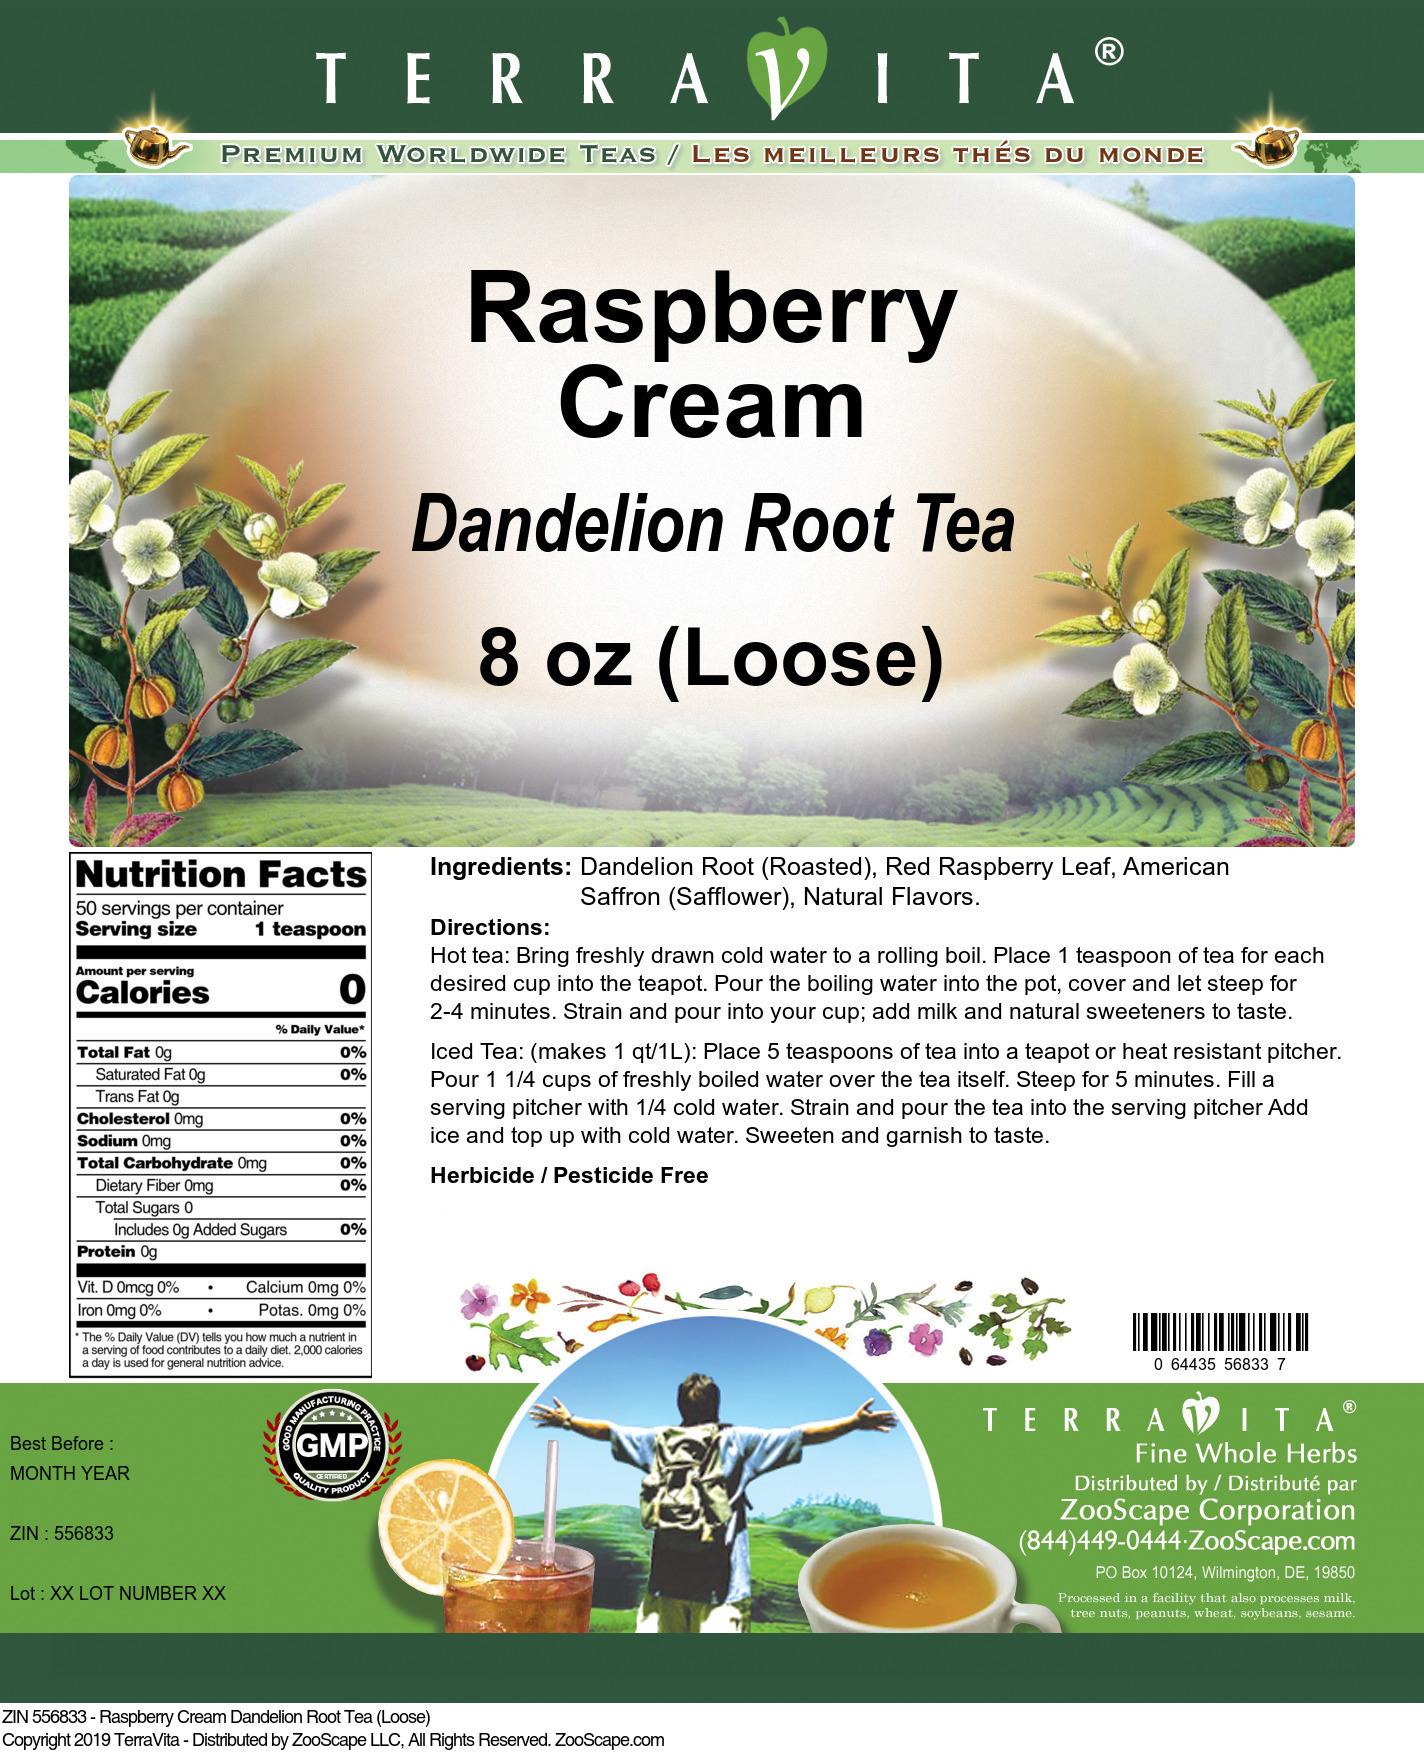 Raspberry Cream Dandelion Root Tea (Loose)